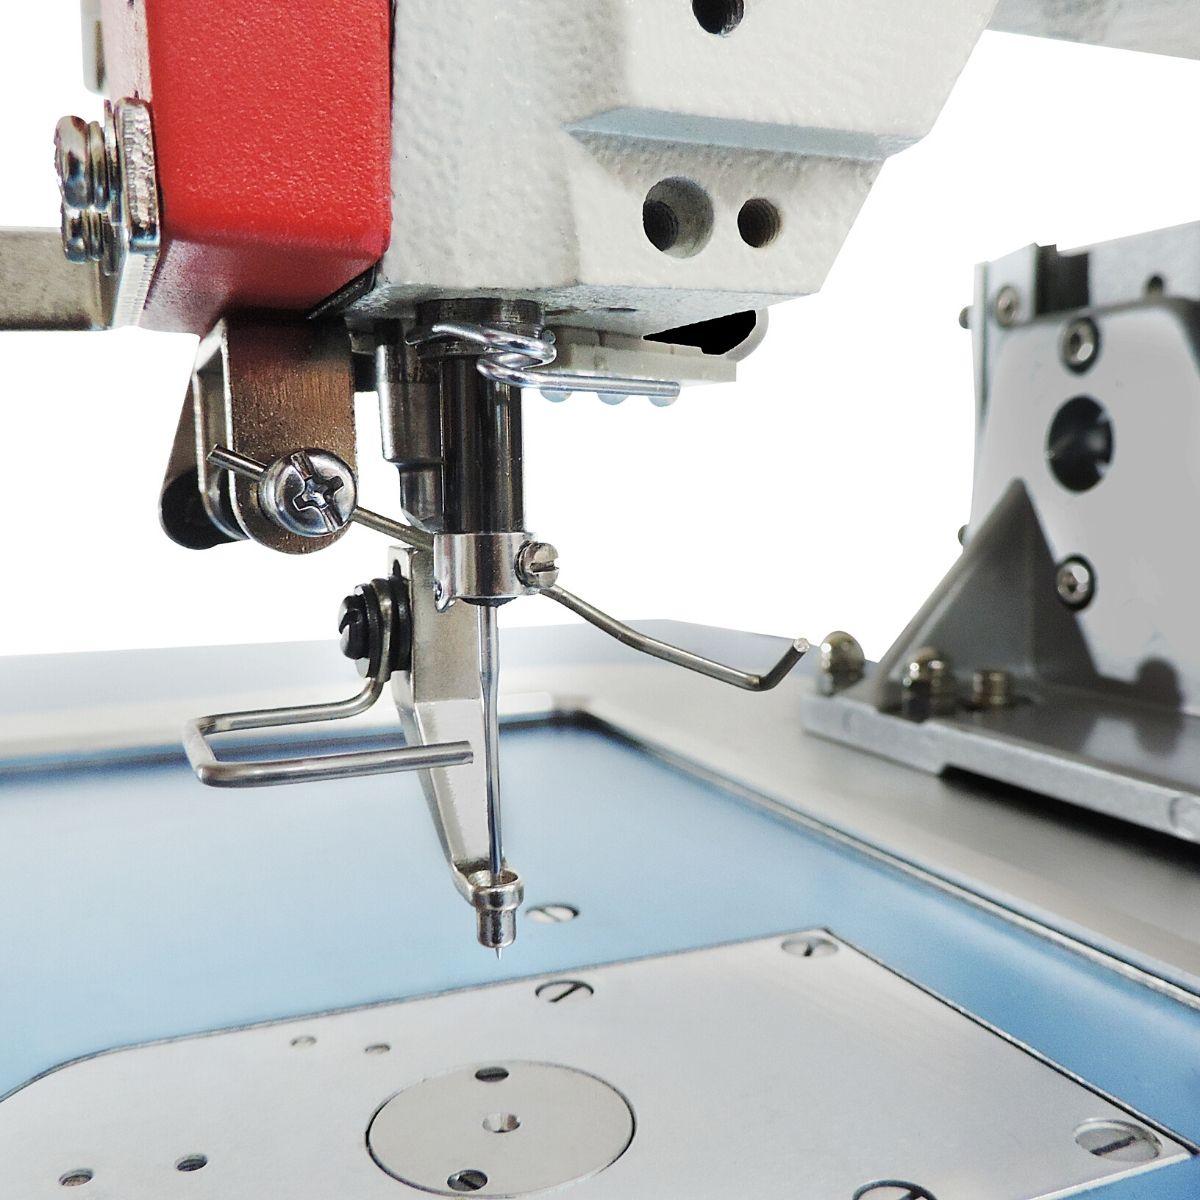 Máquina de Costura Industrial Filigrana Lançadeira Rotativa Westman W-F-3020